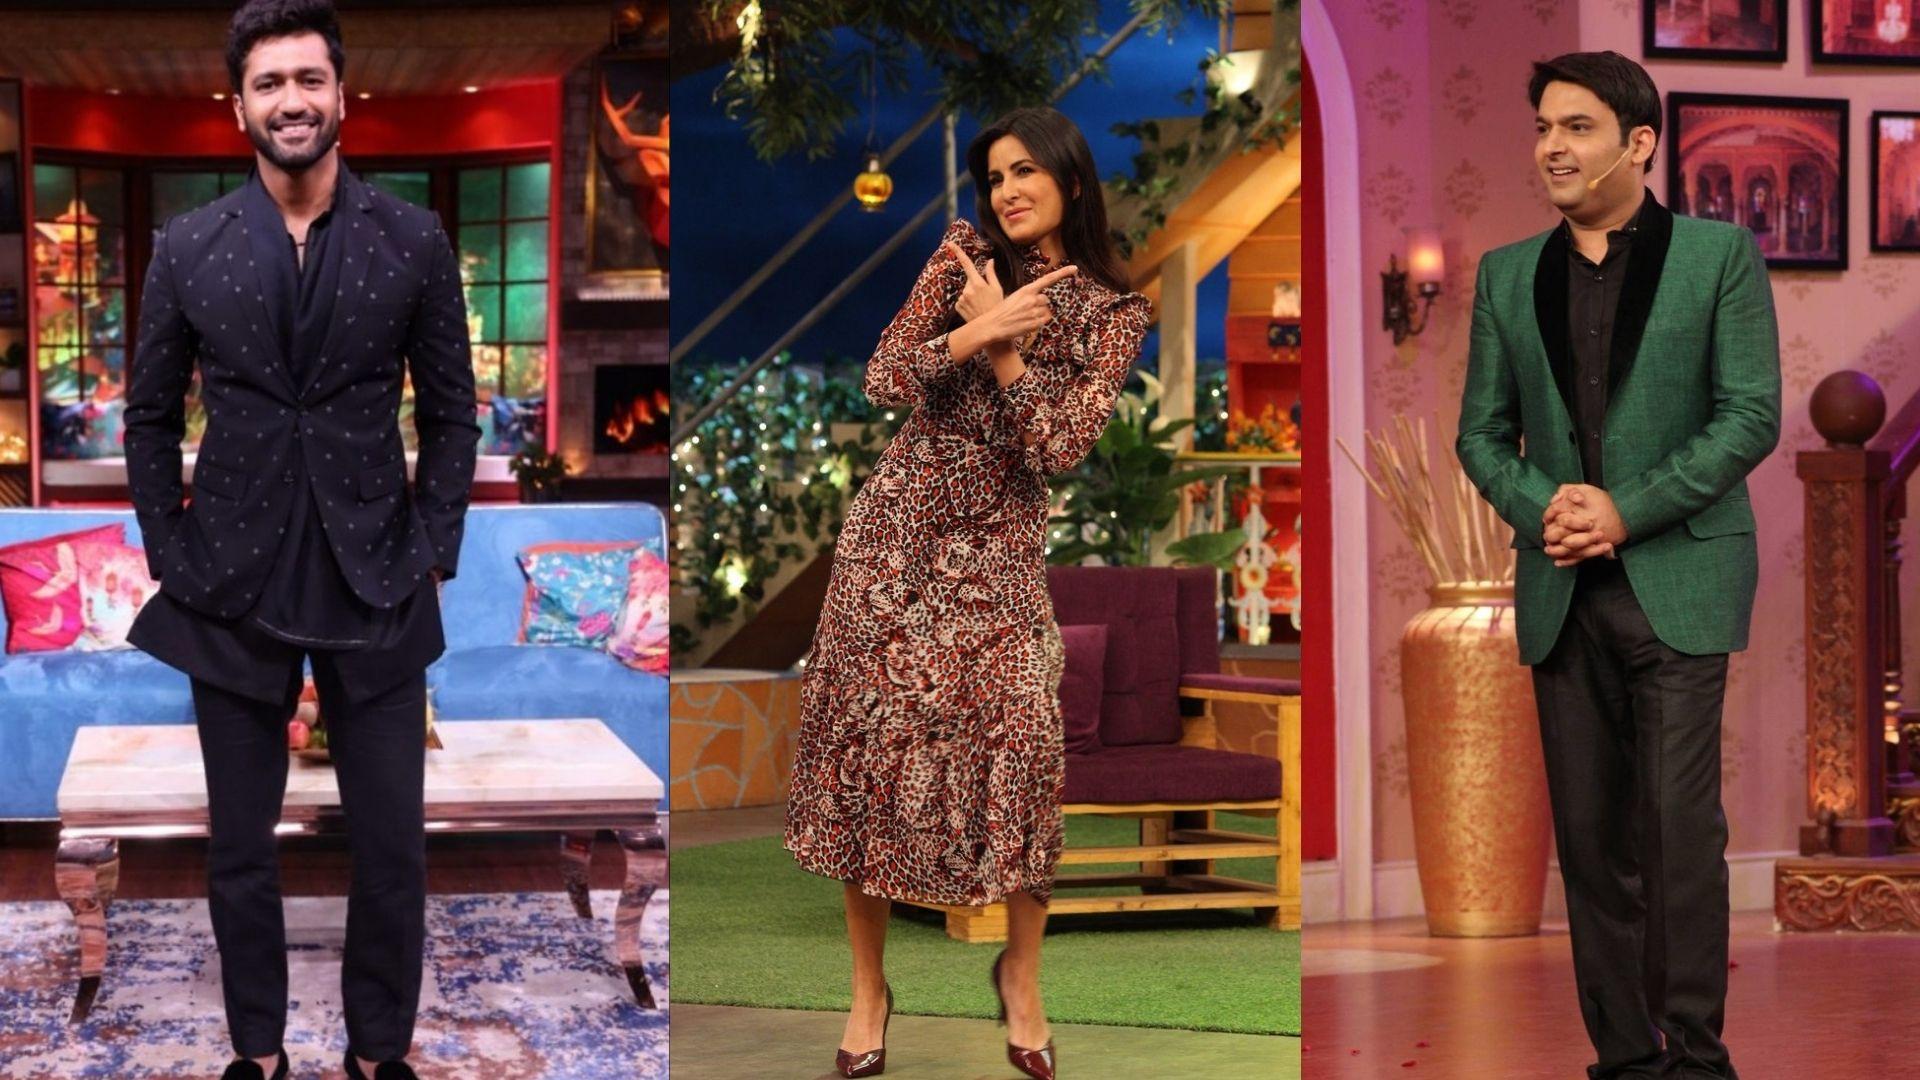 Vicky Kaushal Sneaks Out To Meet Rumoured Girlfriend Katrina Kaif; Kapil Sharma Lifts The Curtains